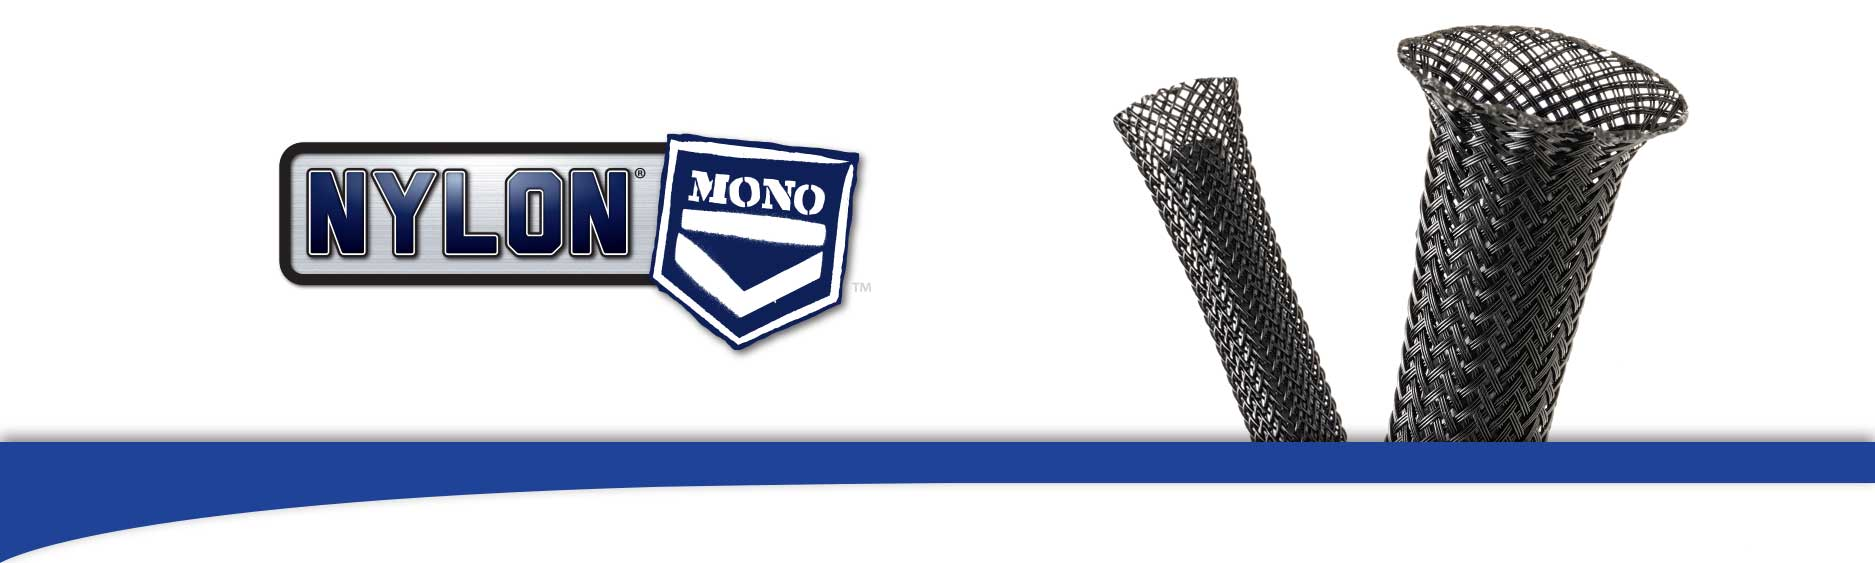 Nylon Mono